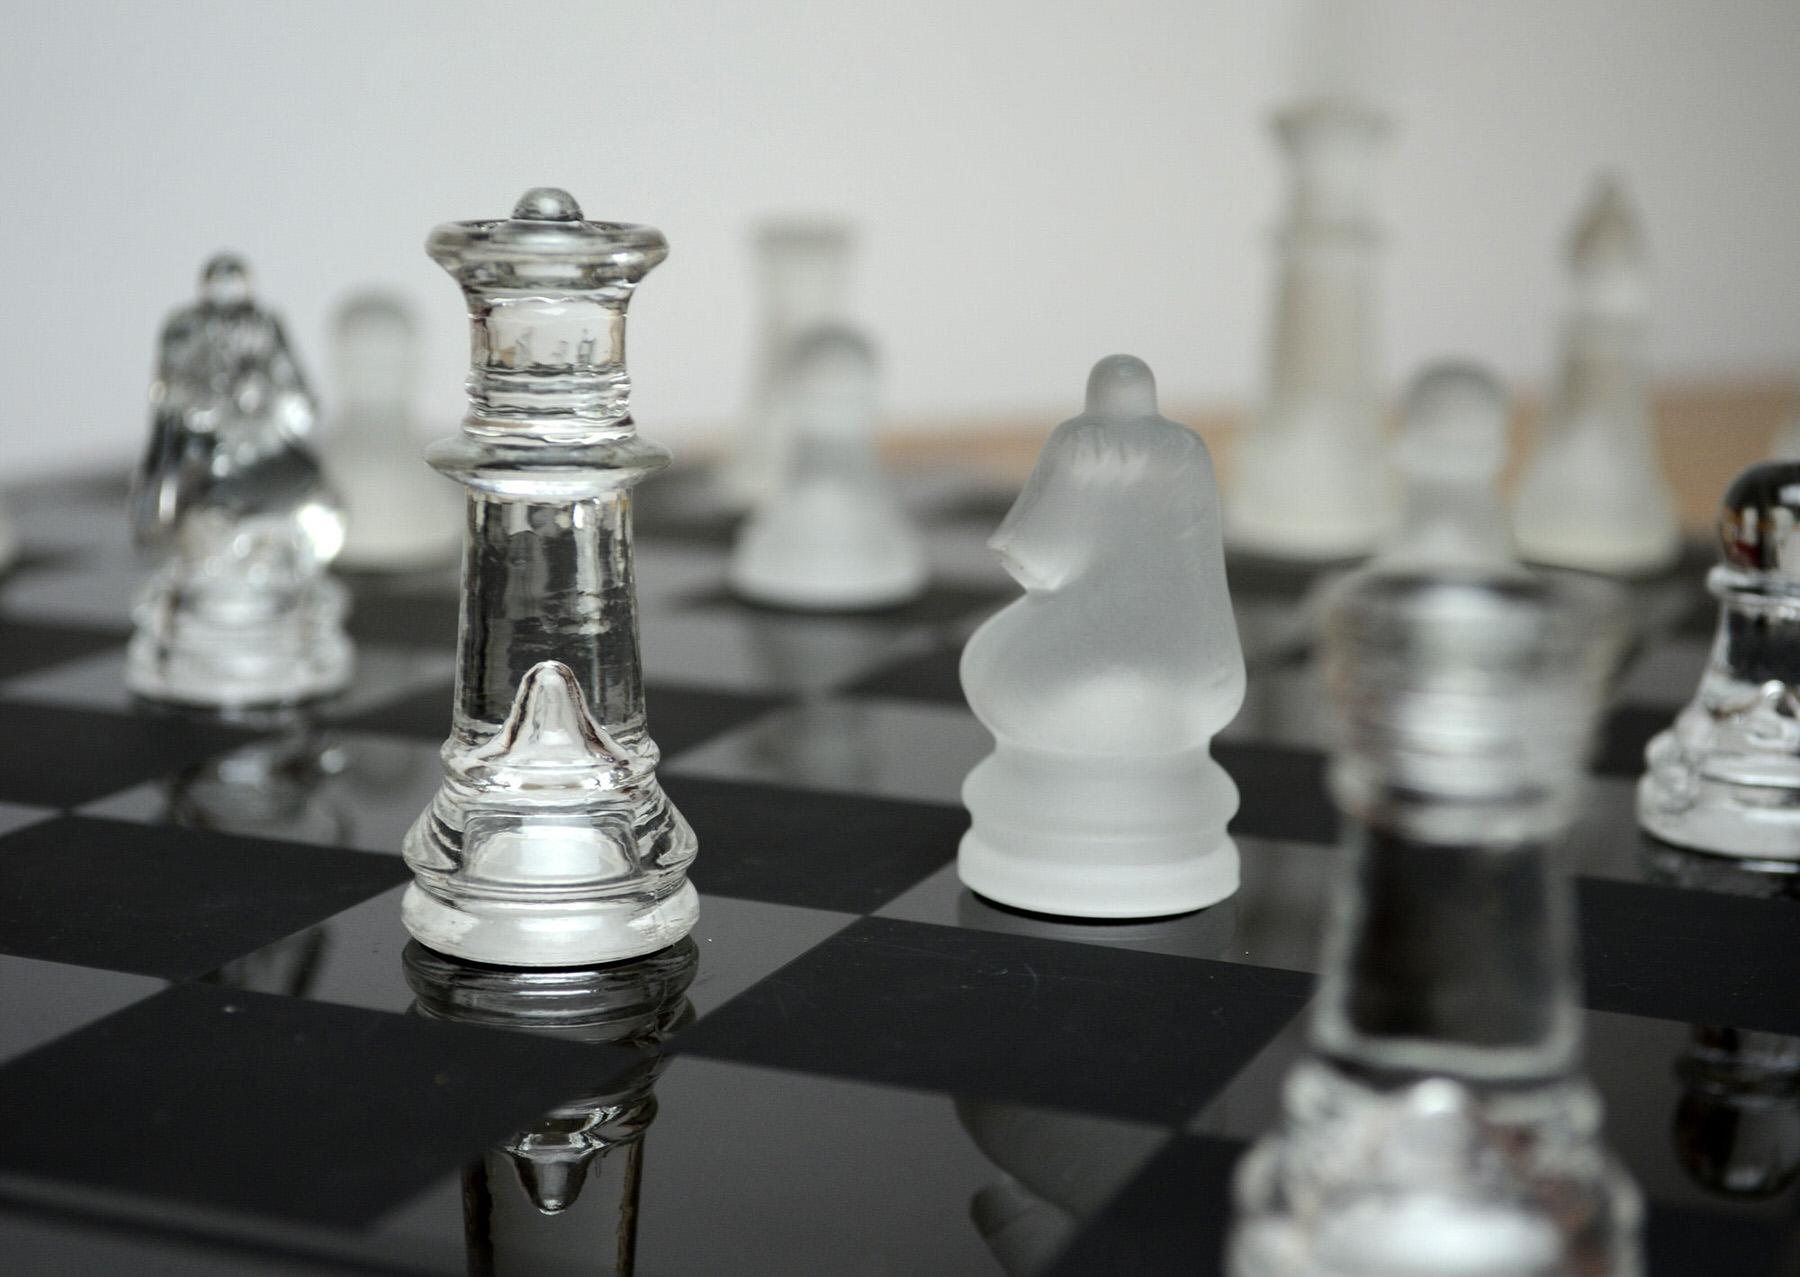 Glass Chess Set Image